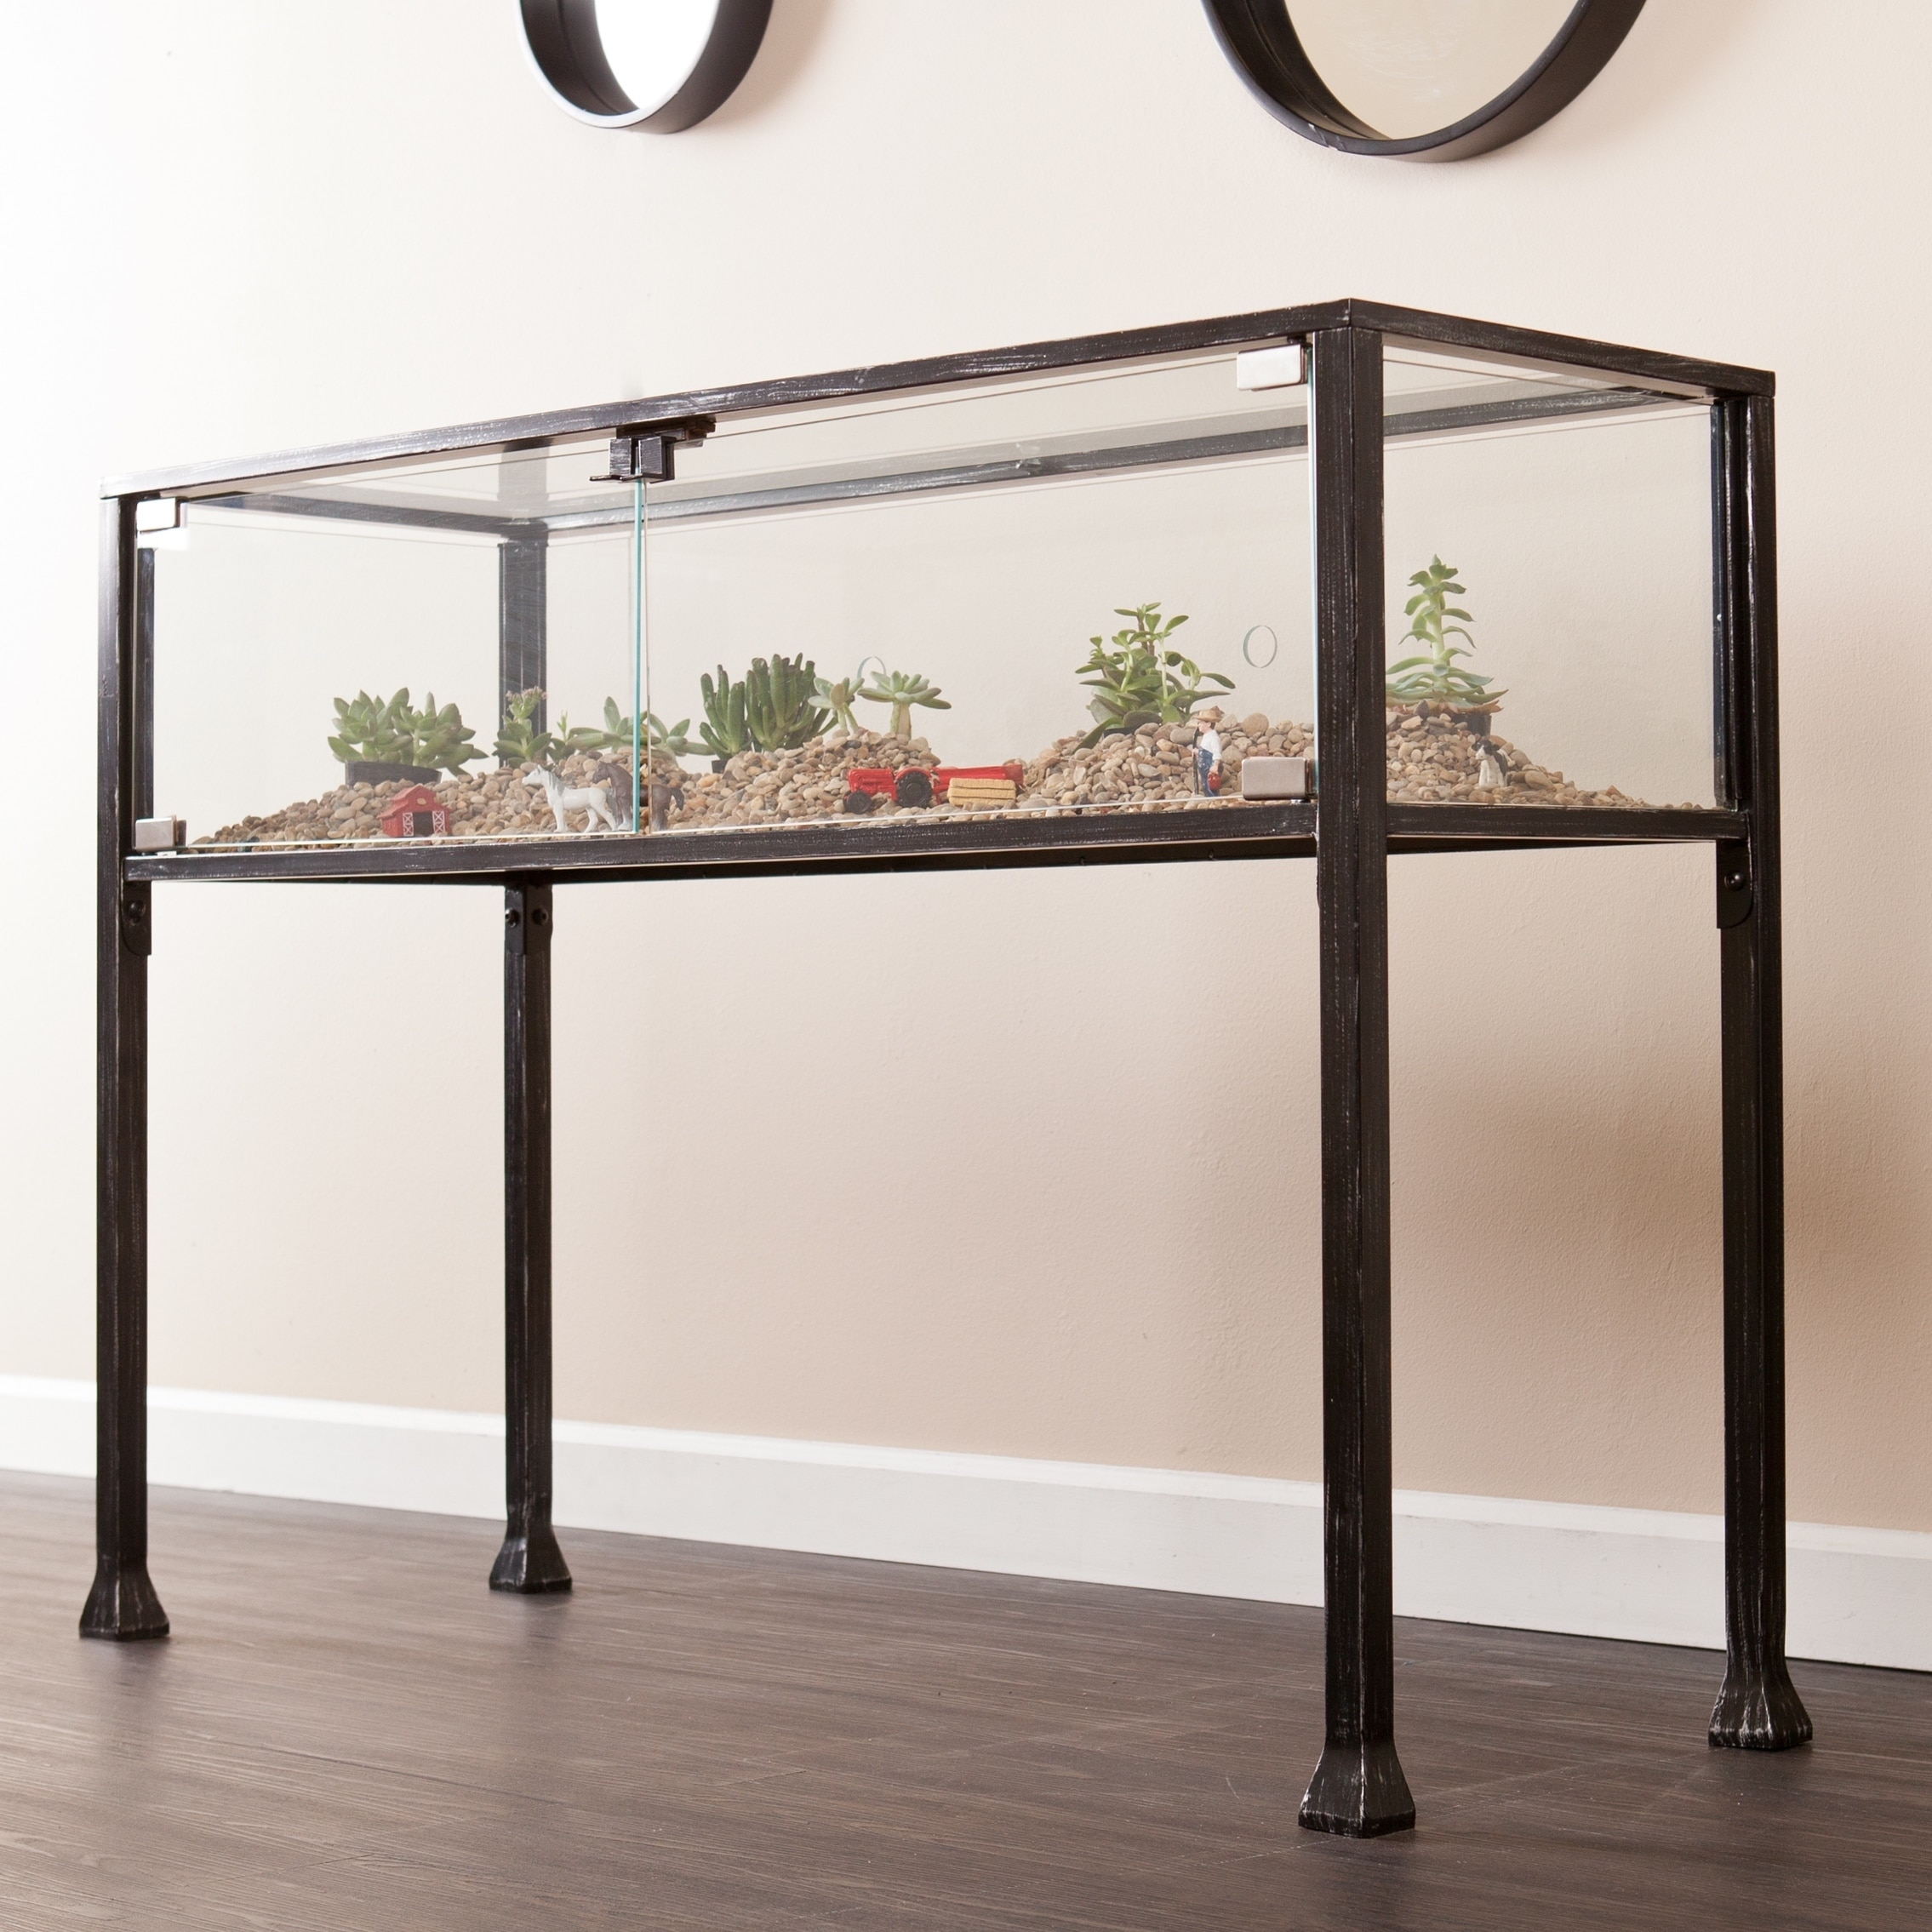 Harper Blvd  Display/ Terrarium Console/ Sofa Table